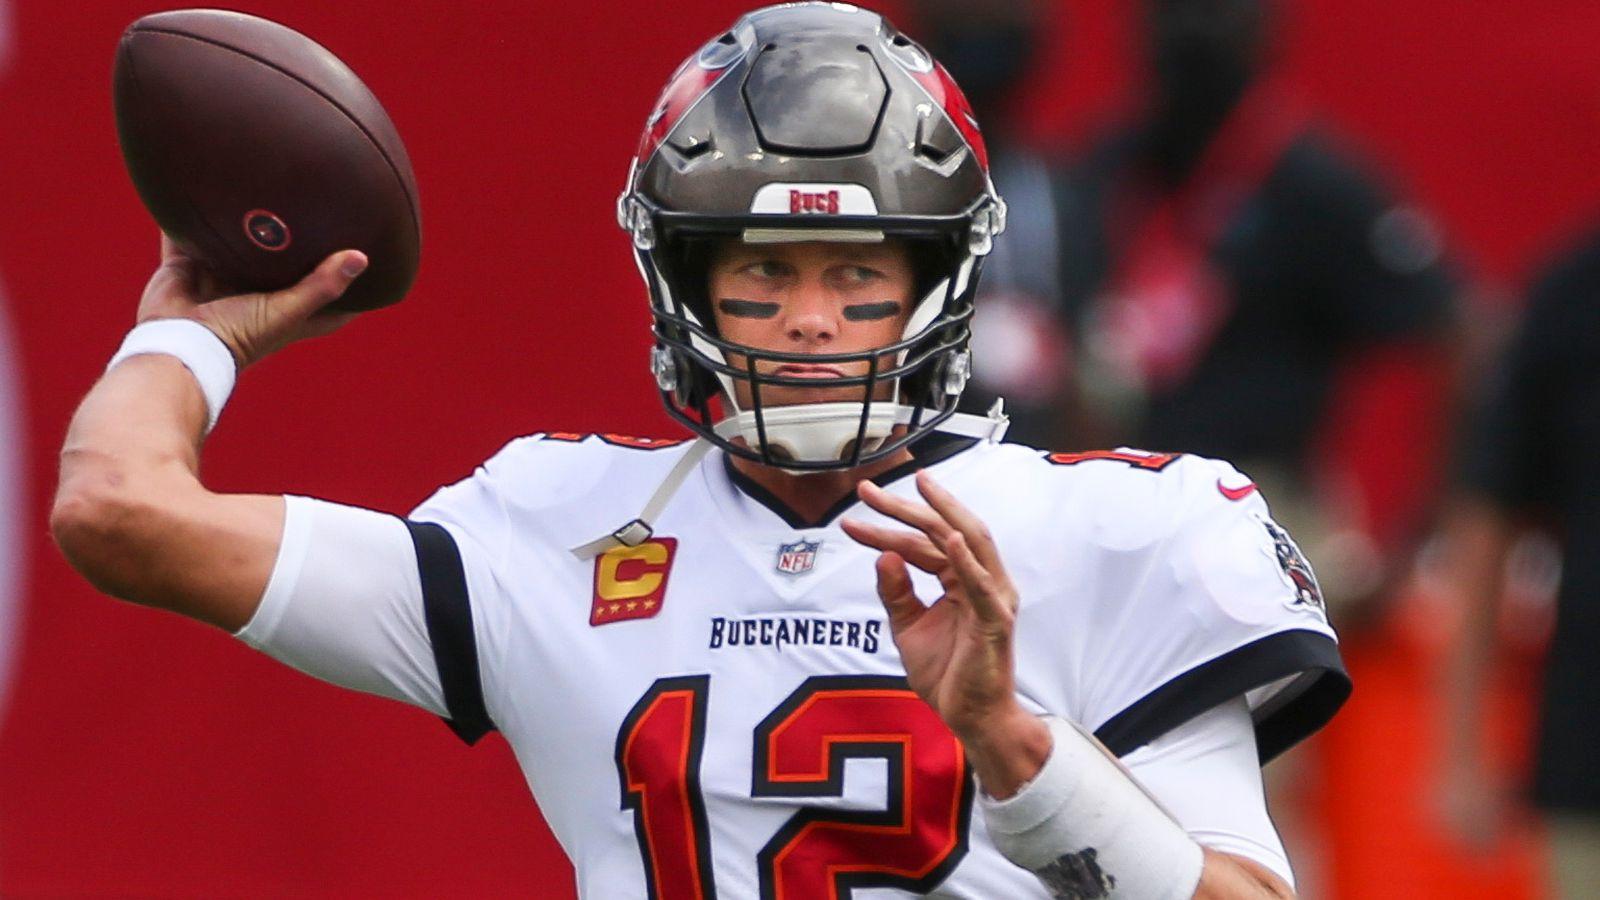 Buccaneers' Tom Brady blasts 'dumb' new NFL uniform number rule